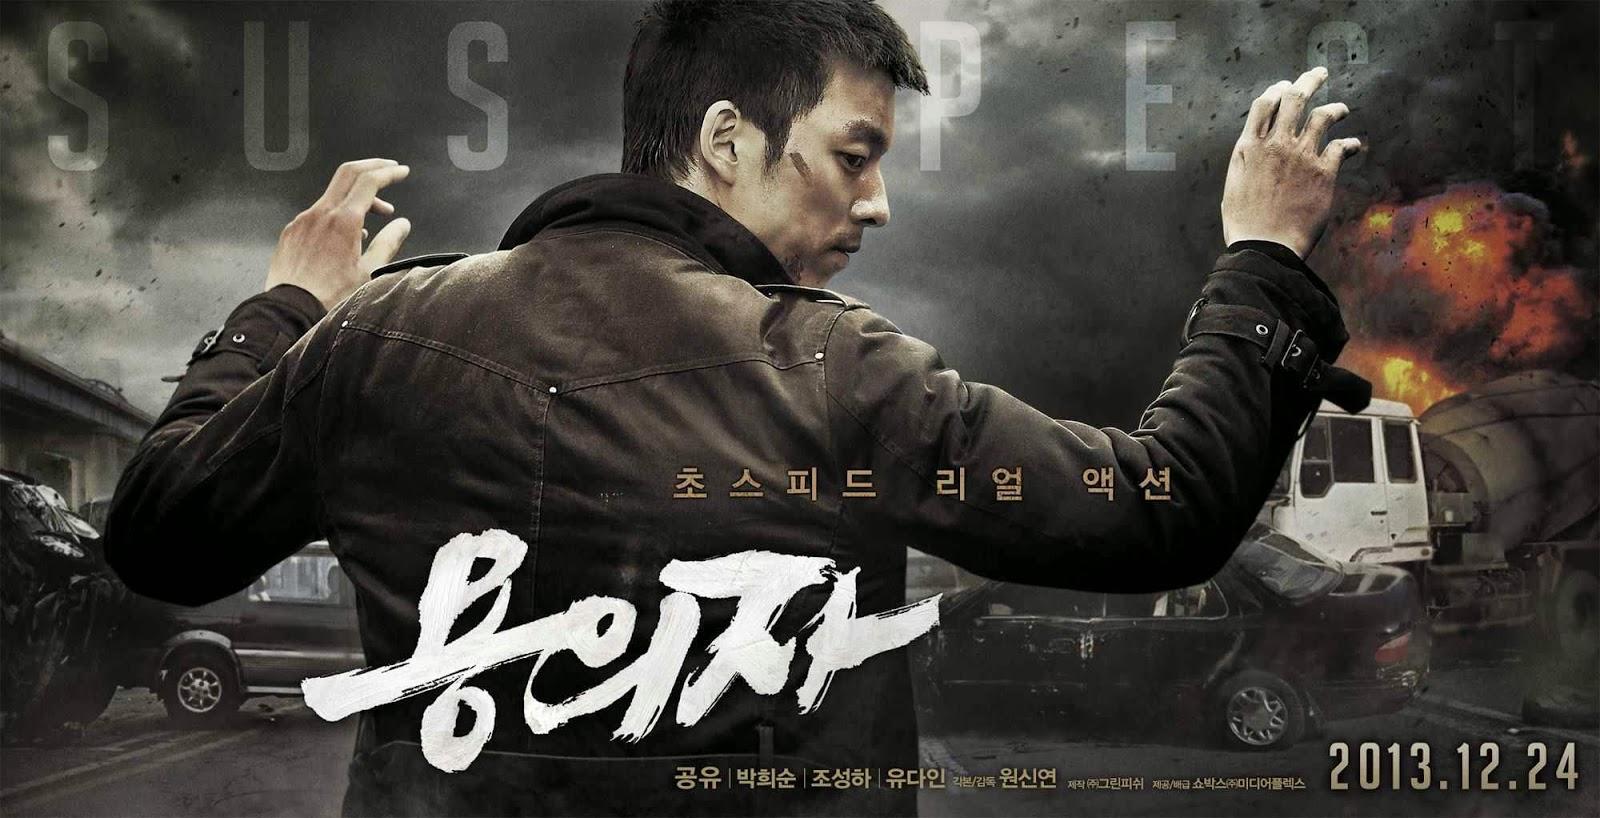 Films to watch 2013 thriller / Junjou romantica cd drama 7